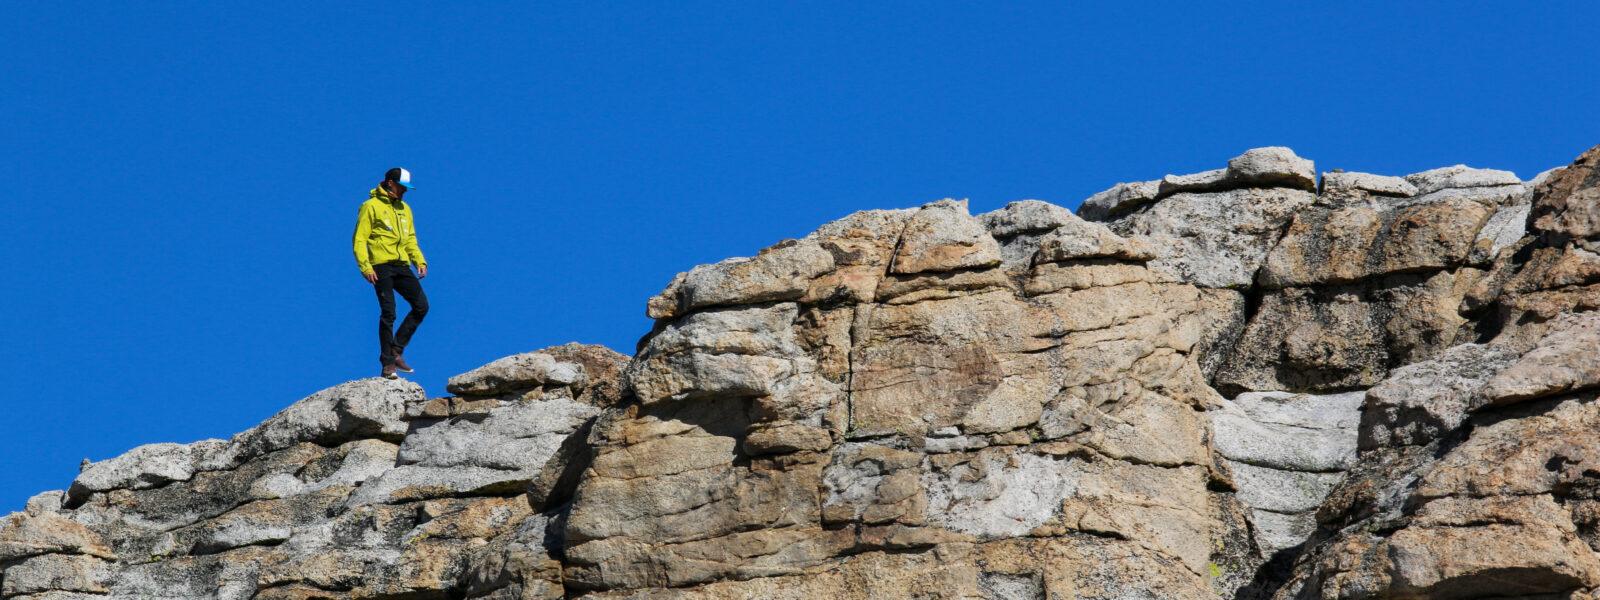 on cloudrock